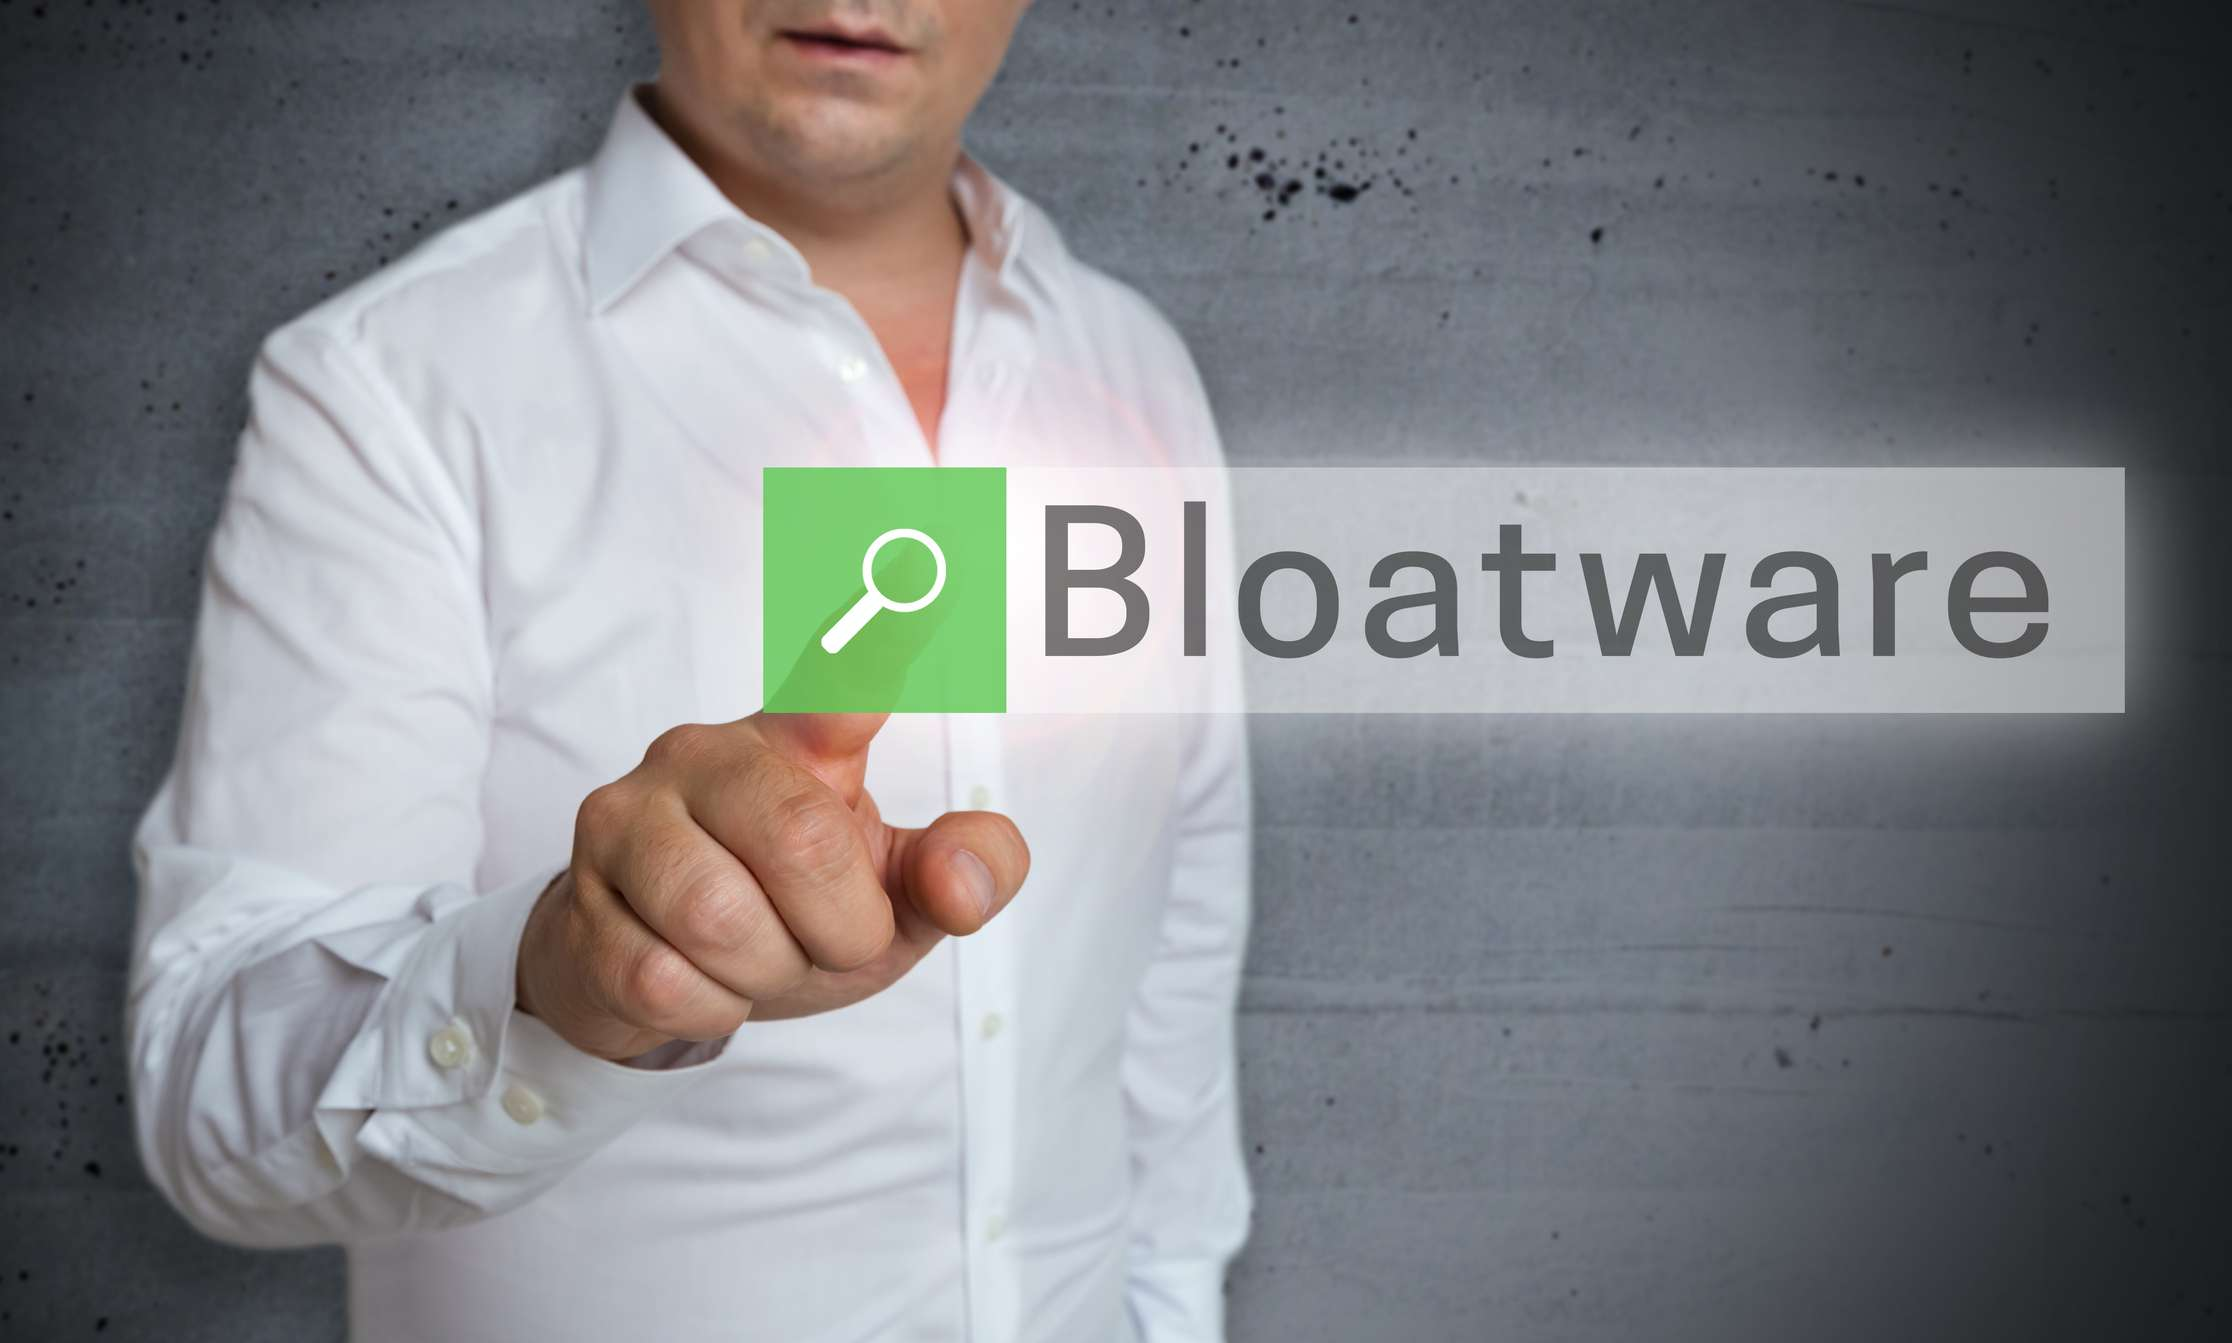 Bloatware on screen in front of man